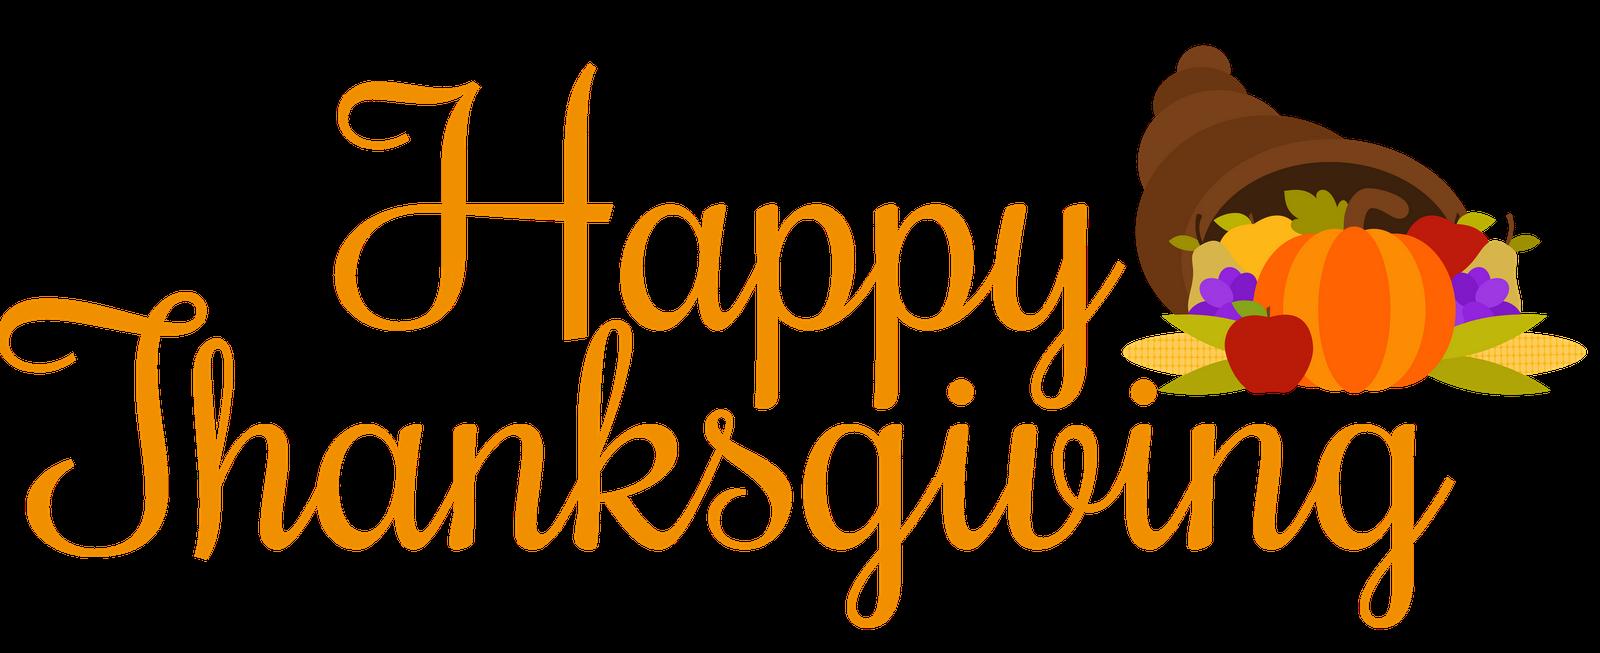 Clipart coloring page thanksgiving transparent Thanksgiving Day Clipart, Coloring Pages and Pictures transparent